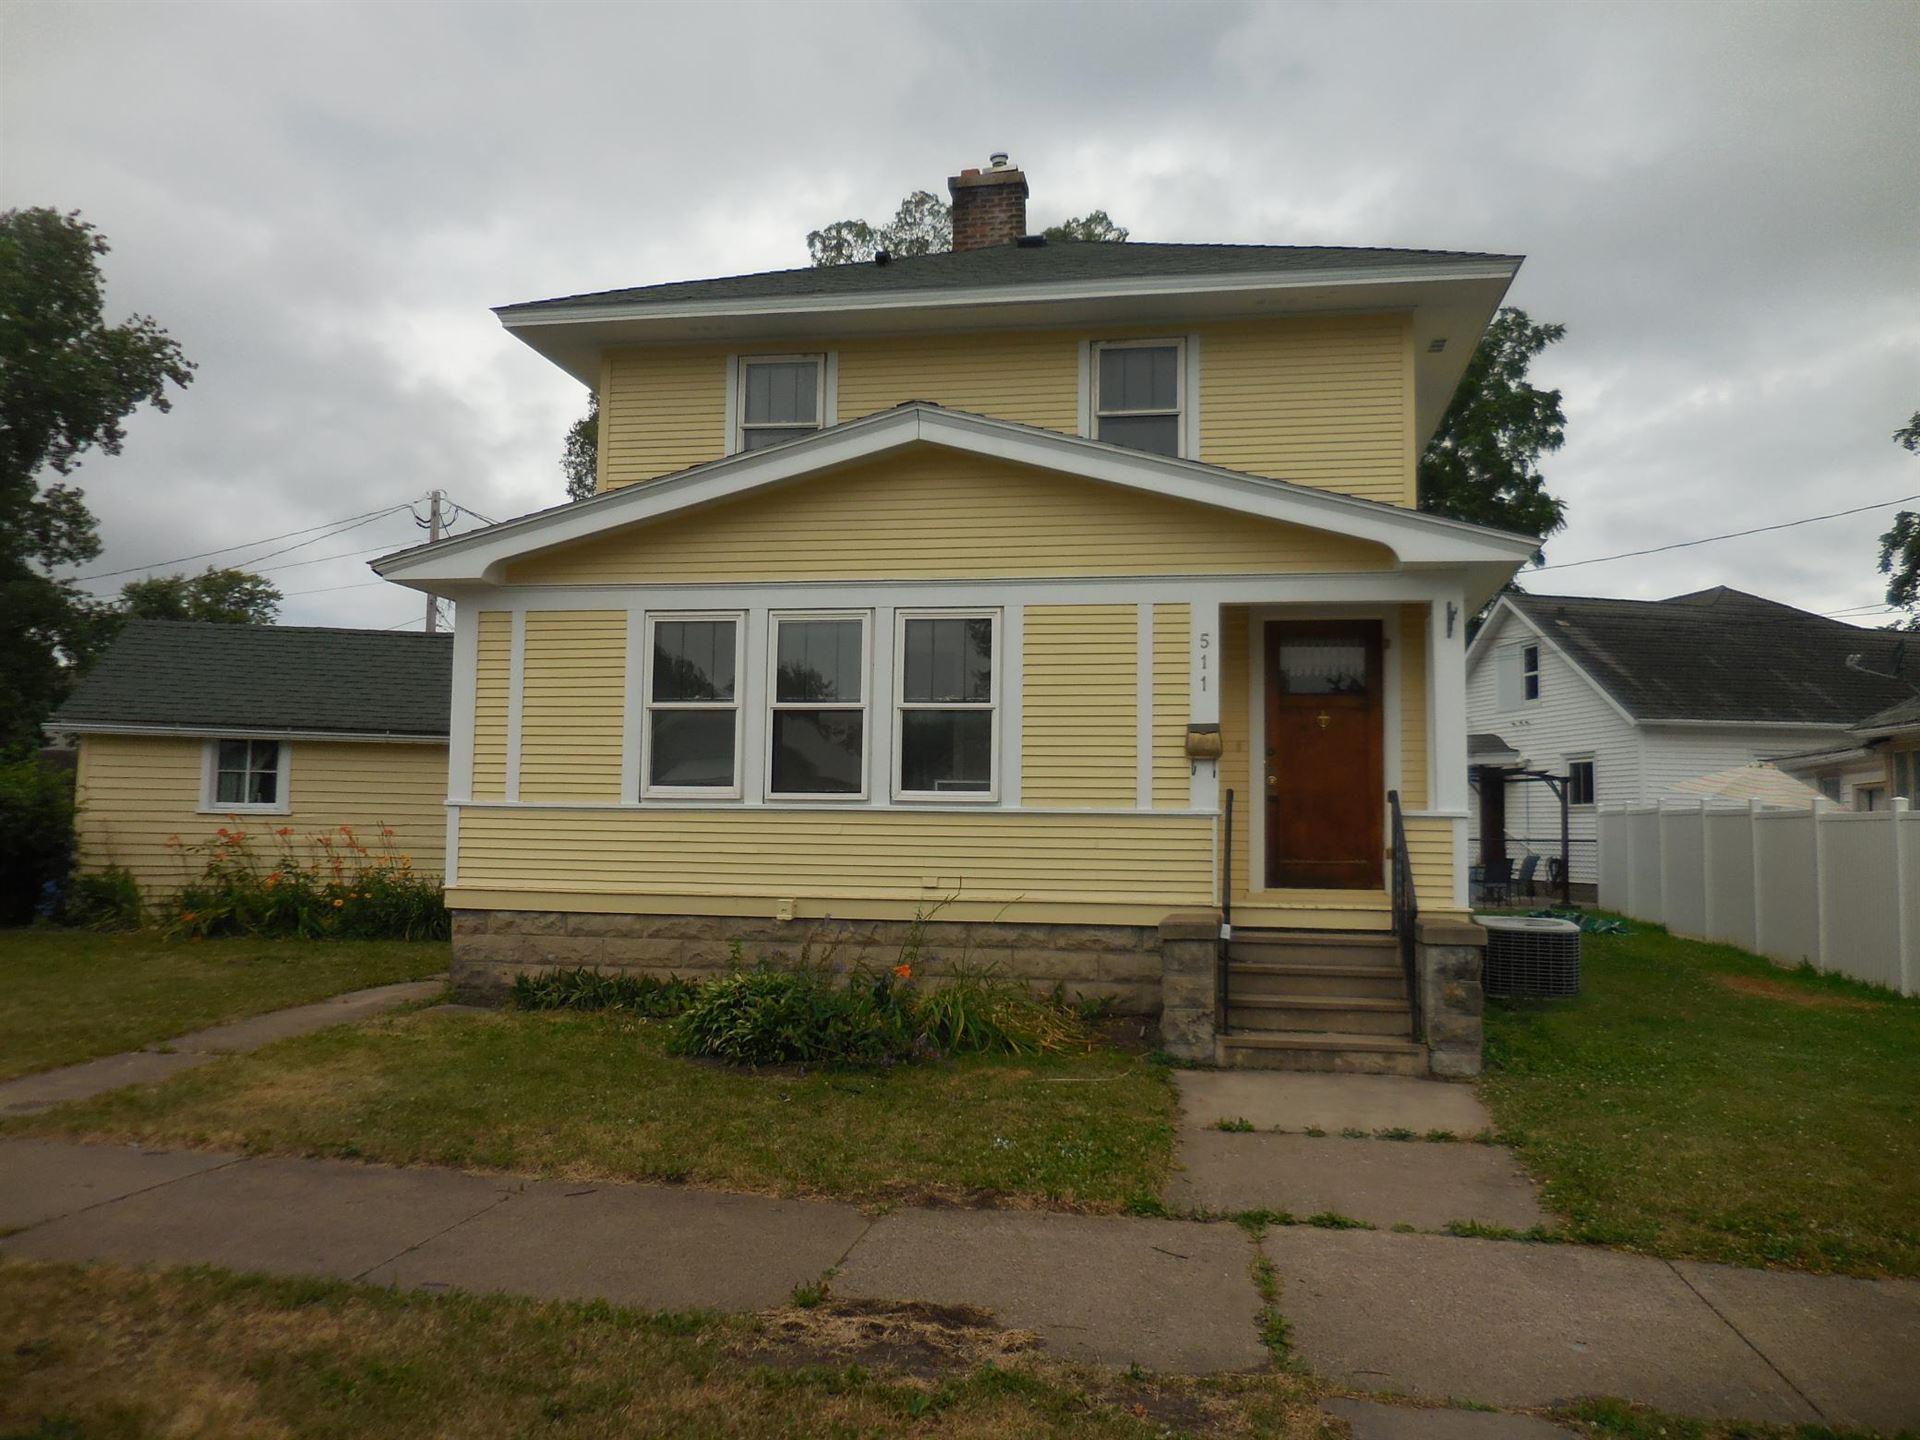 511 Sioux Street, Winona, MN 55987 - MLS#: 5623098